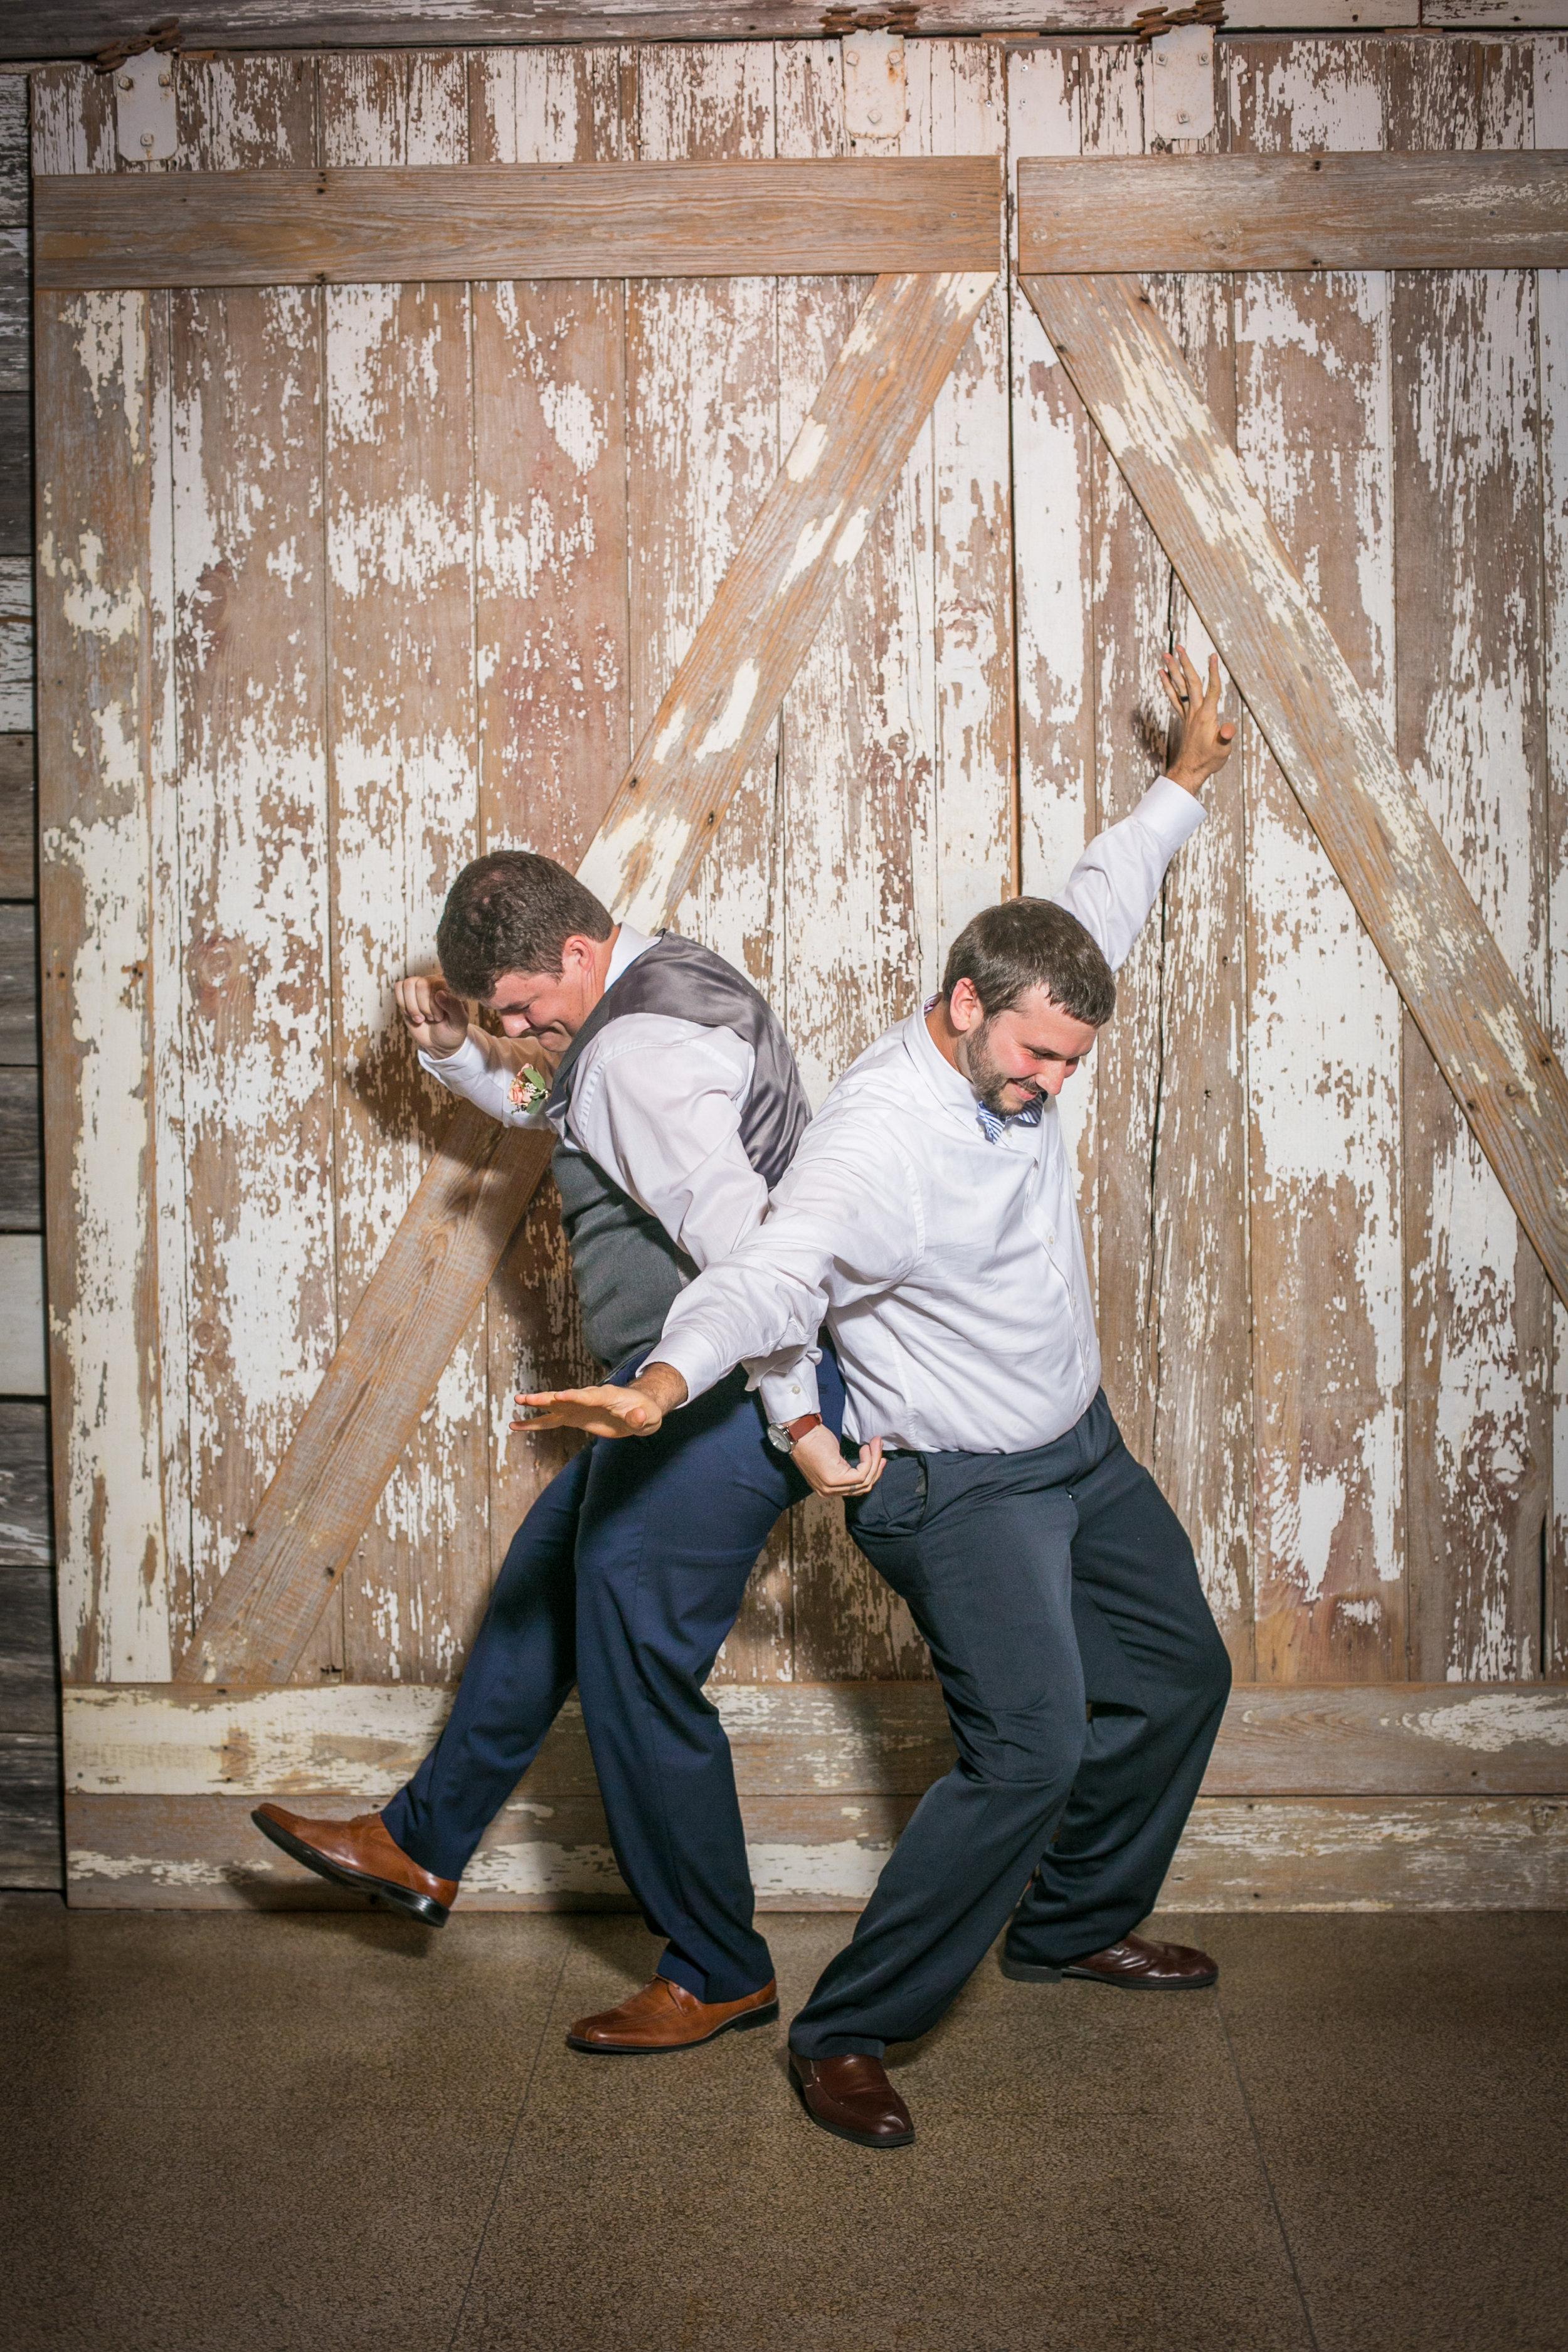 Kansas+City_Small+Wedding_Elope_Intimate_Ceremony_Best+Friends_14.jpg